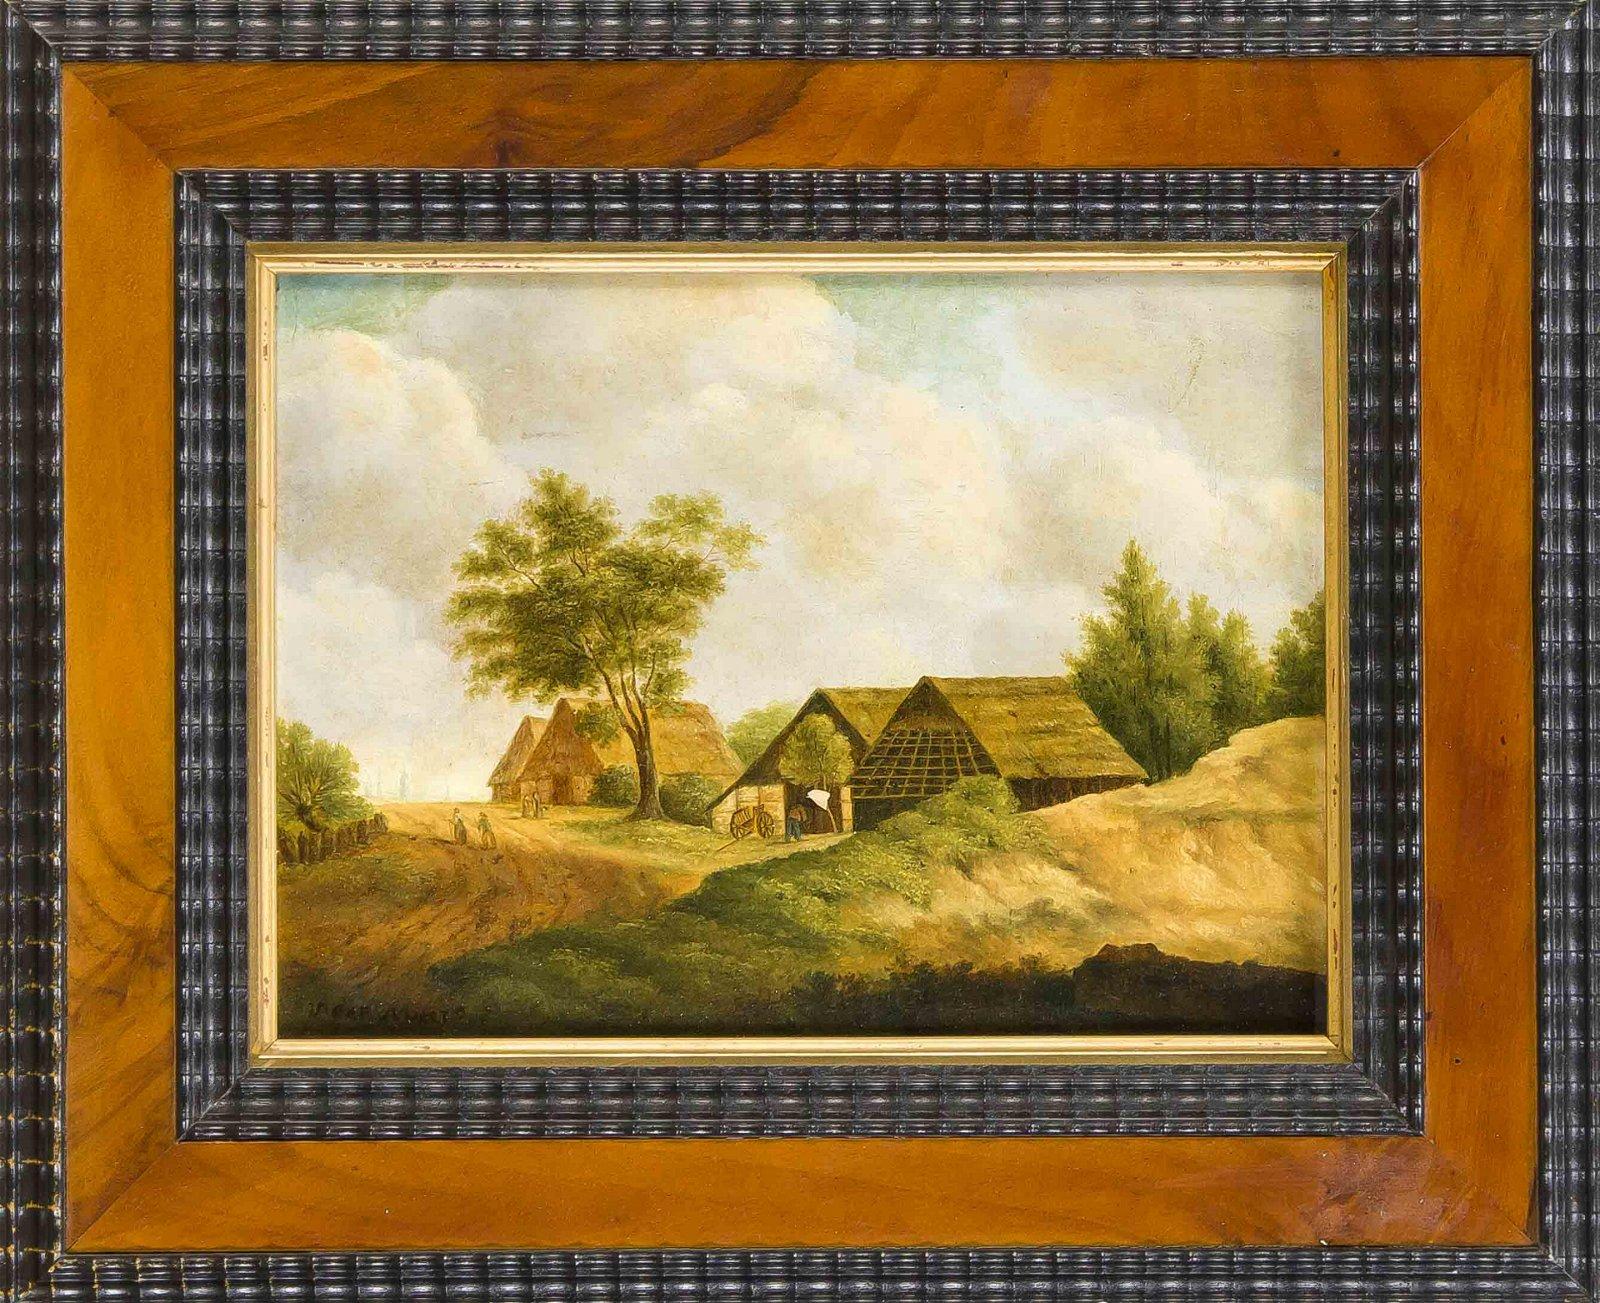 V. de Meer, Dutch painter of the 19th century, village